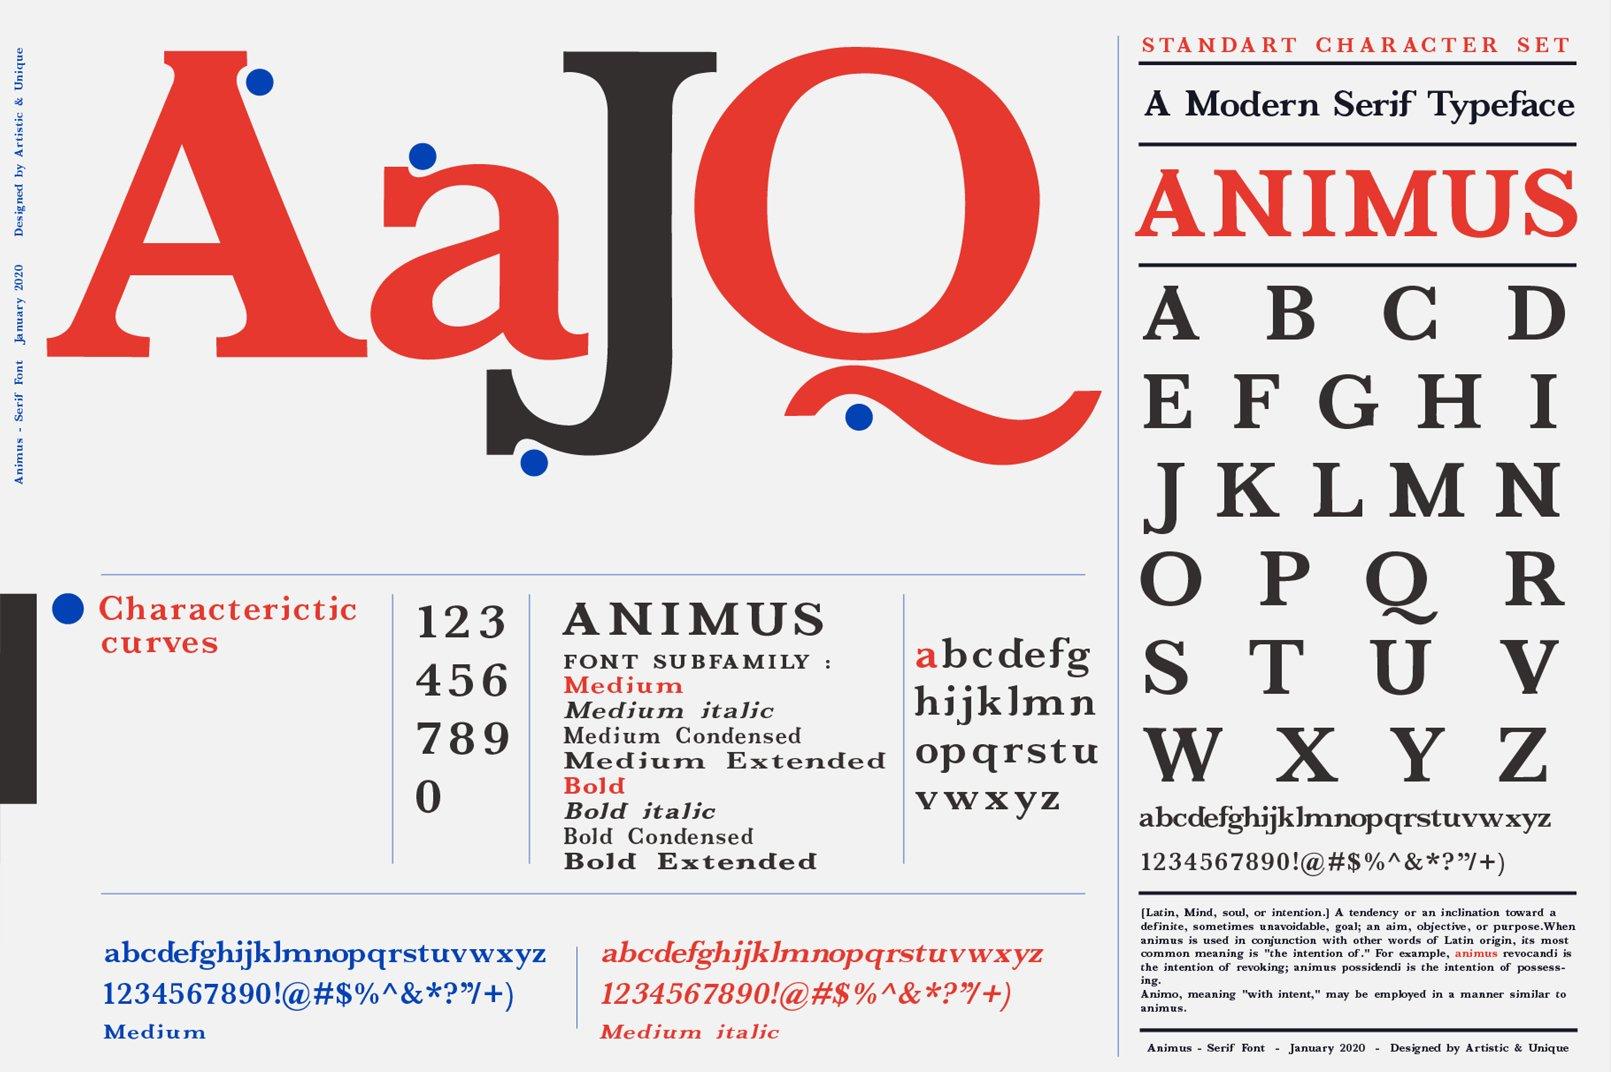 ANIMUS - Serif font family example image 2